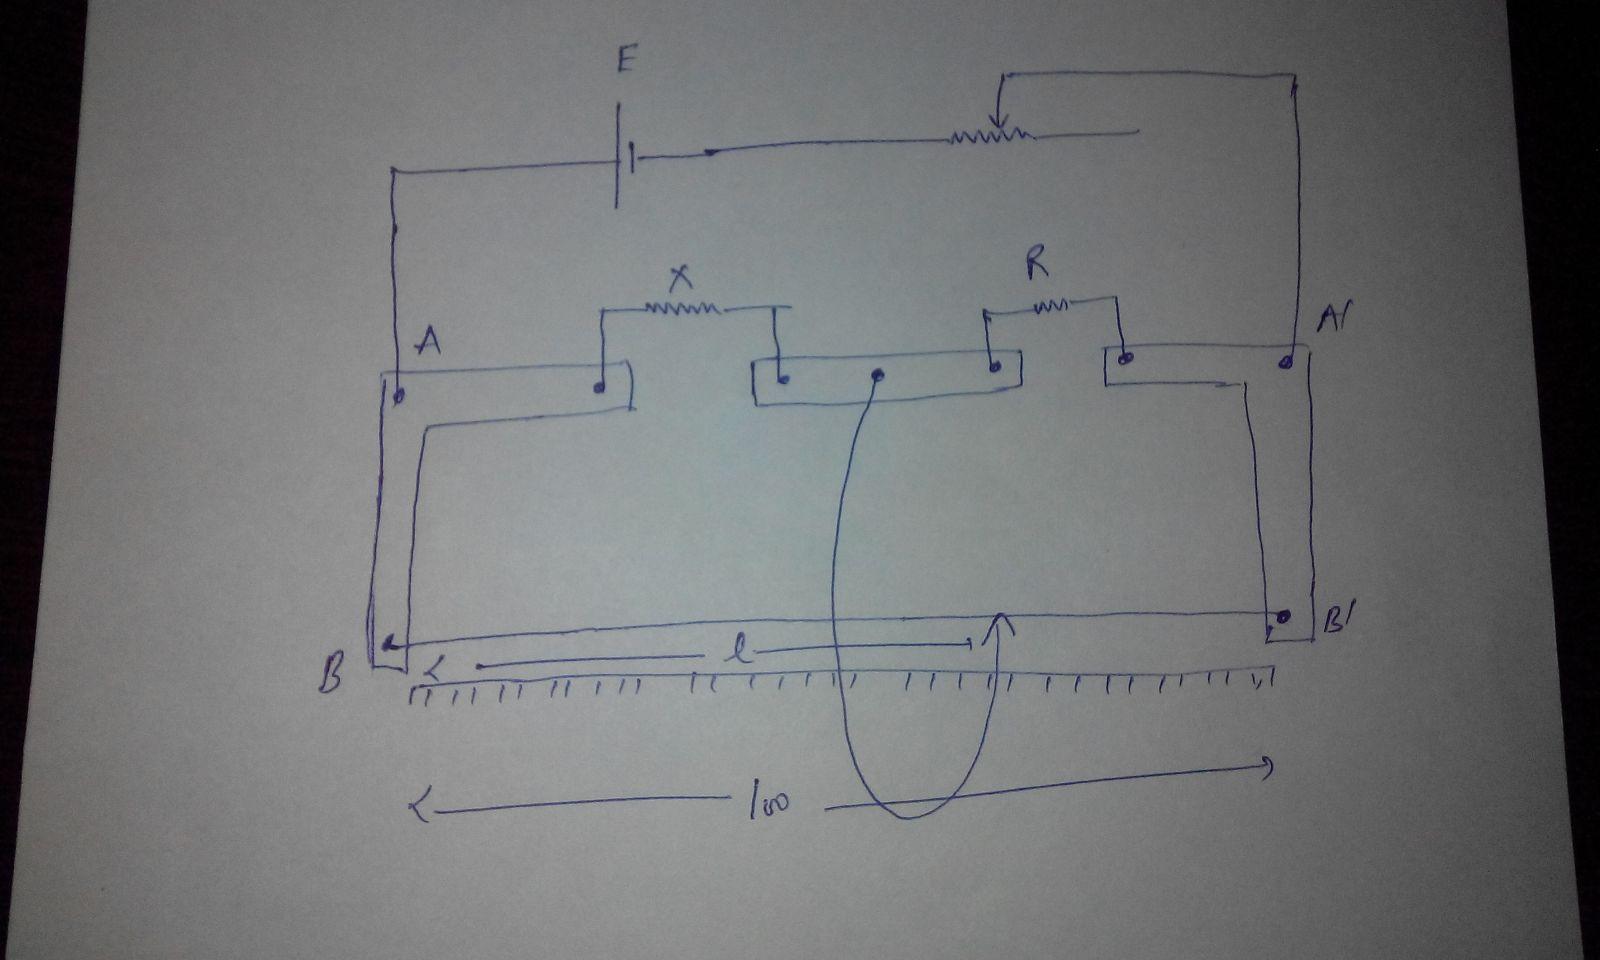 using the principle of wheatstone bridge, describe the method to ...